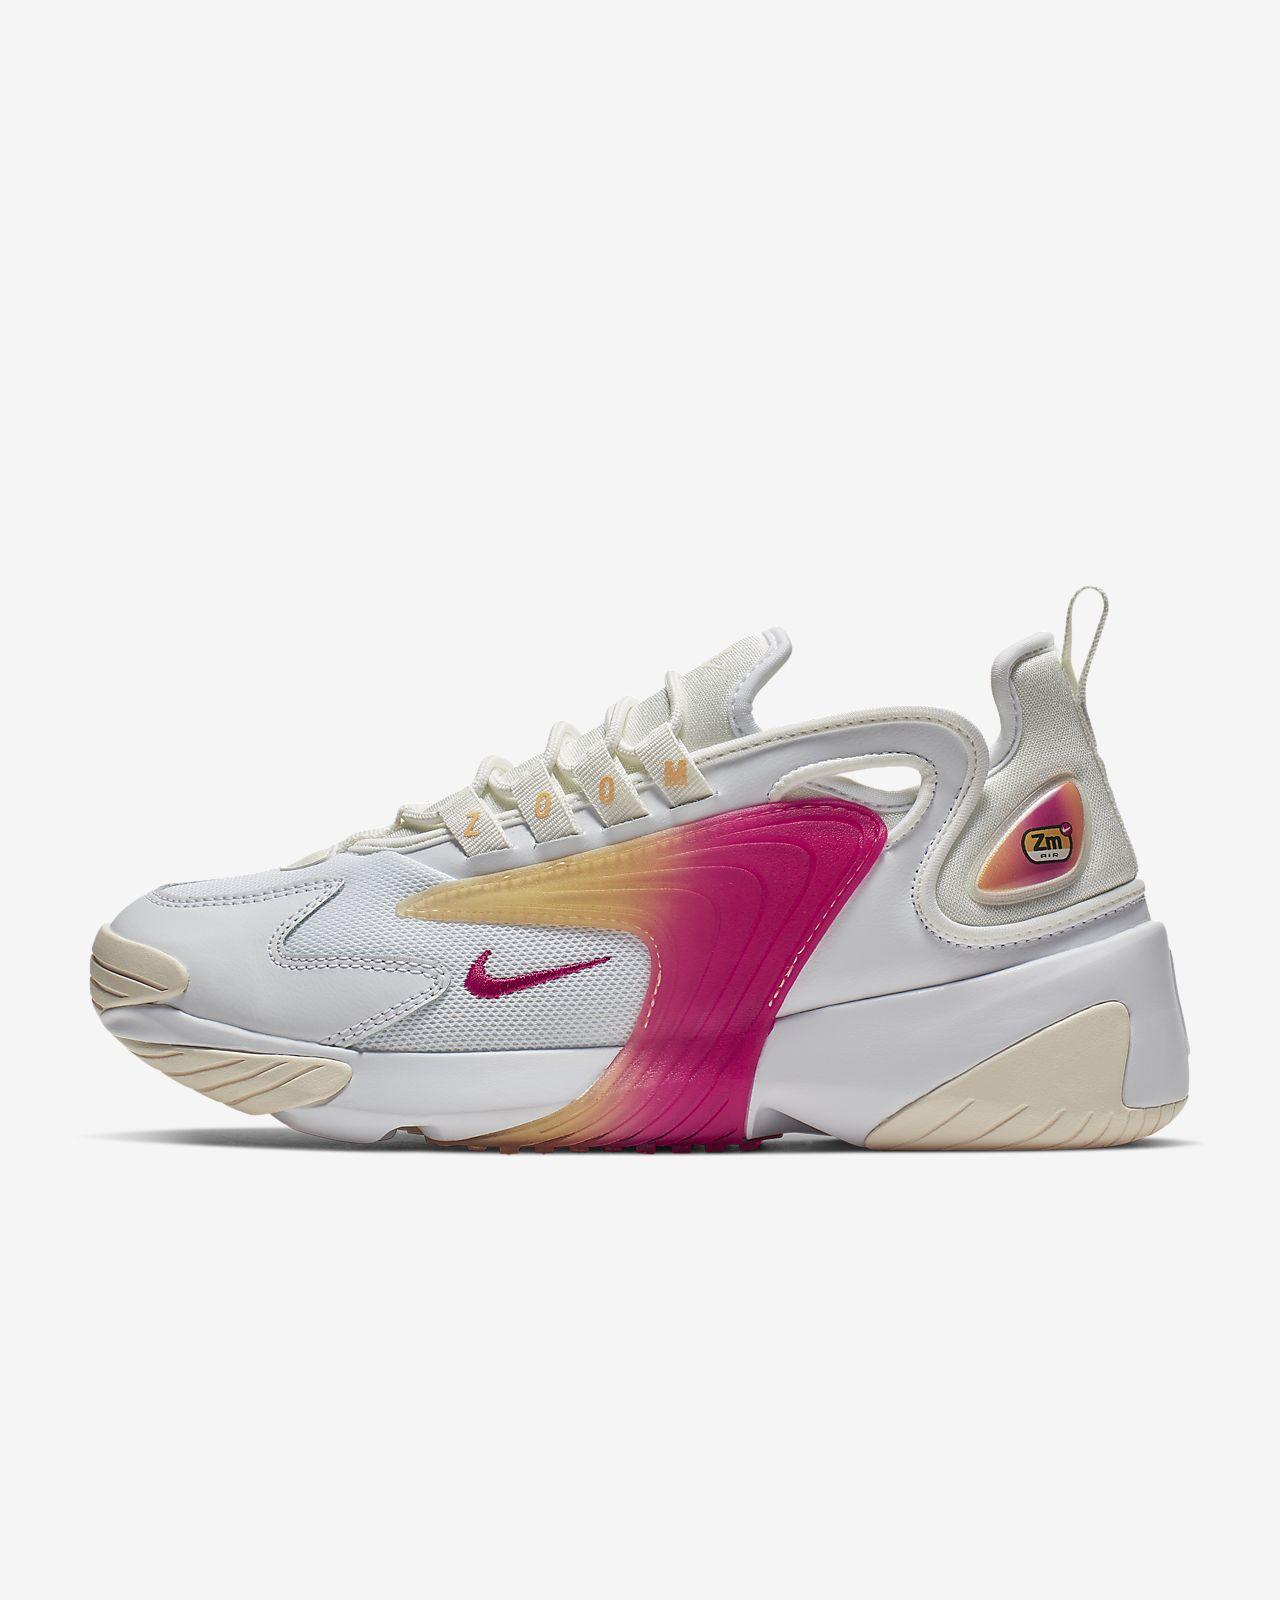 49c6948c2 Sapatilhas Nike Zoom 2K para mulher. Nike.com PT